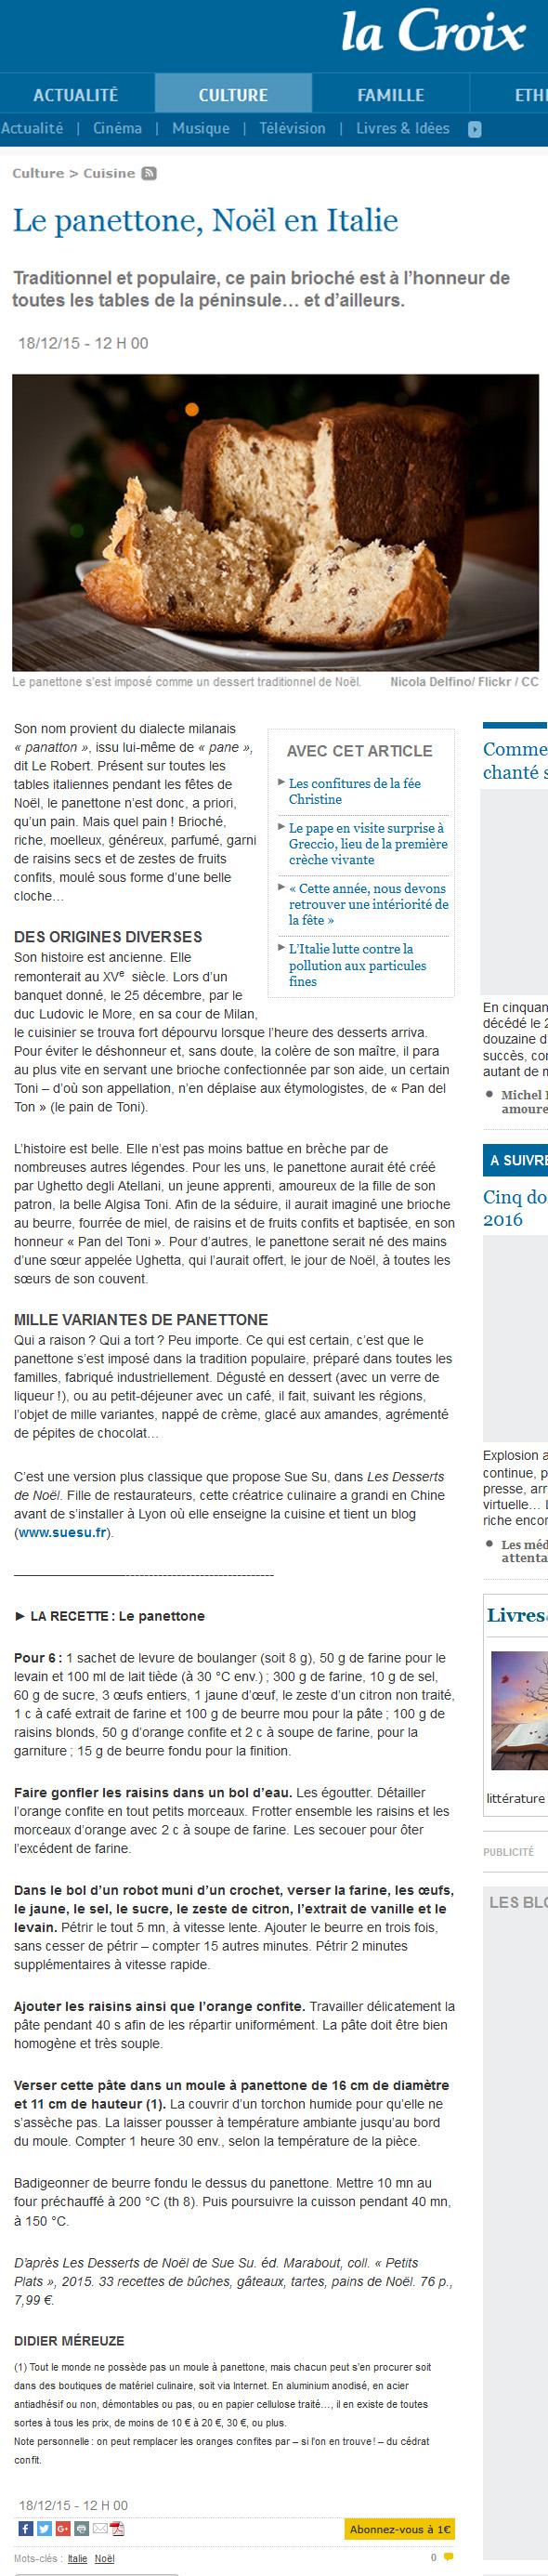 Panettone Lacroix-2